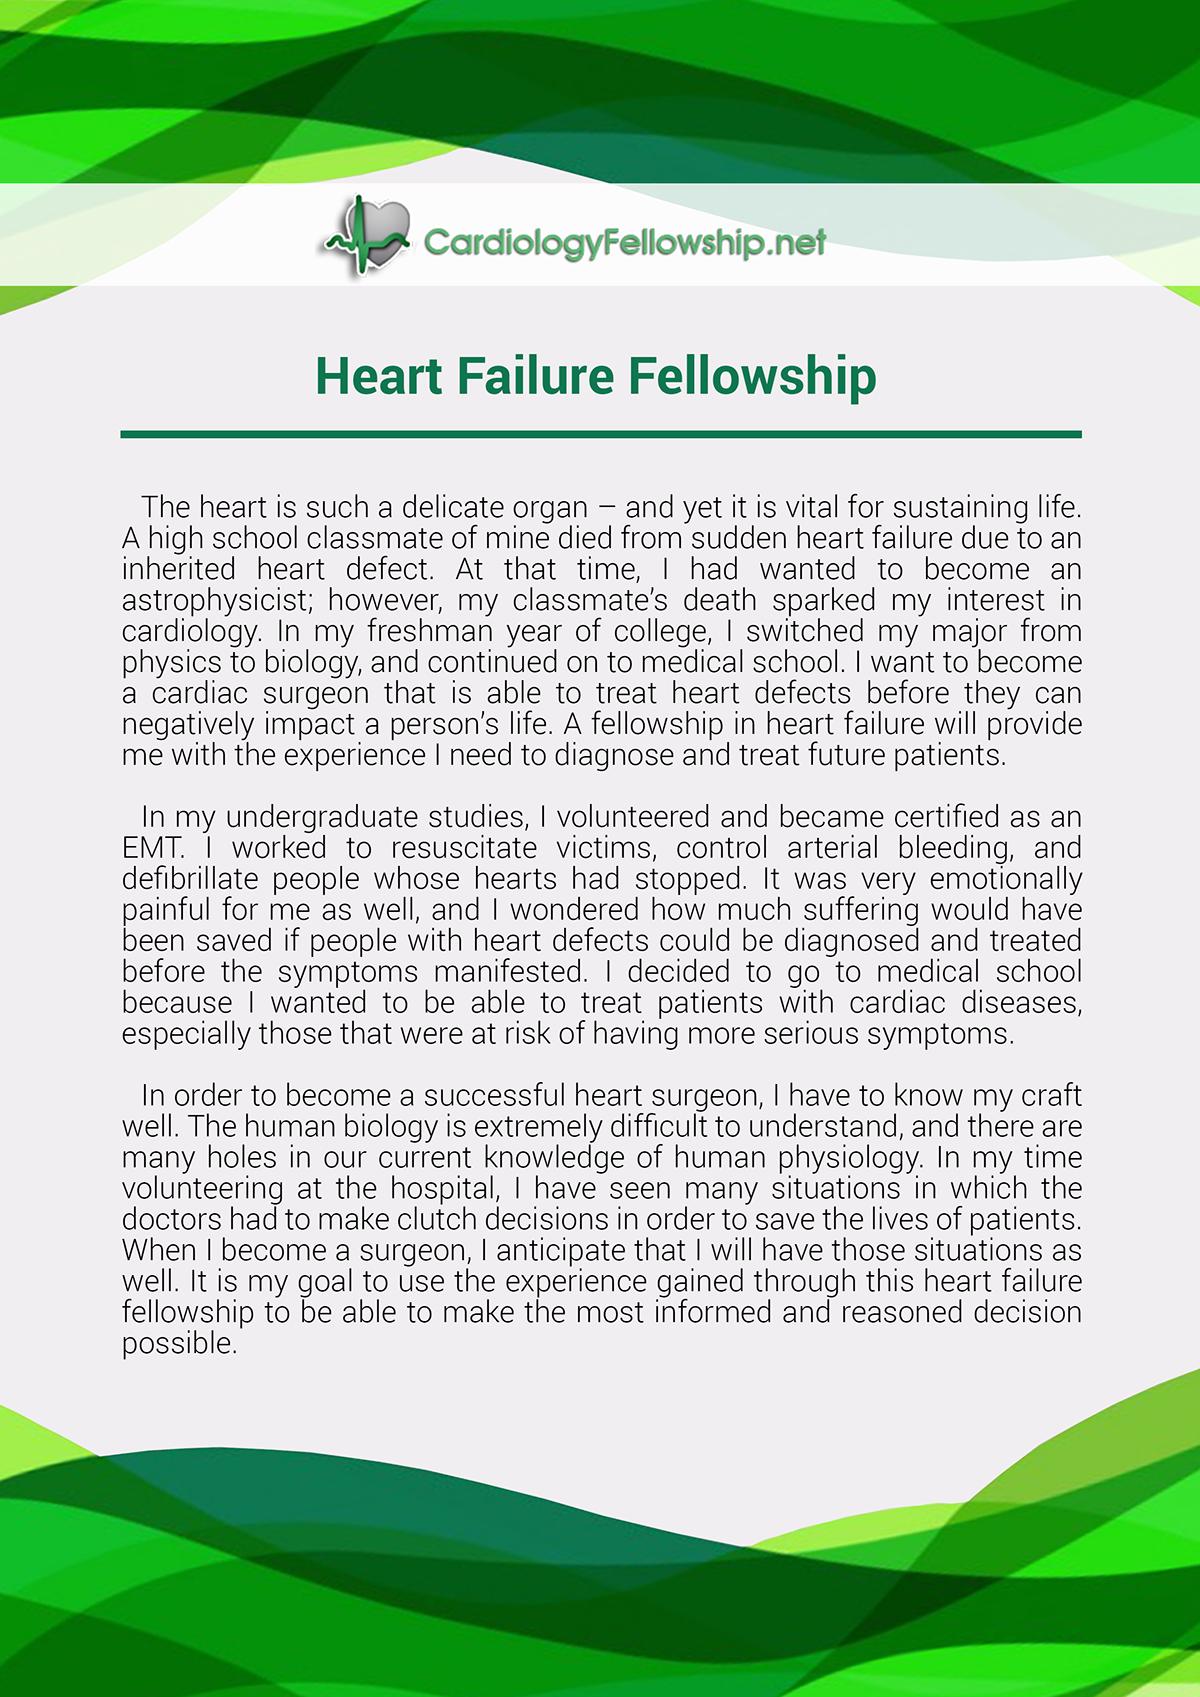 Heart Failure Fellowship Personal Statement Sample on